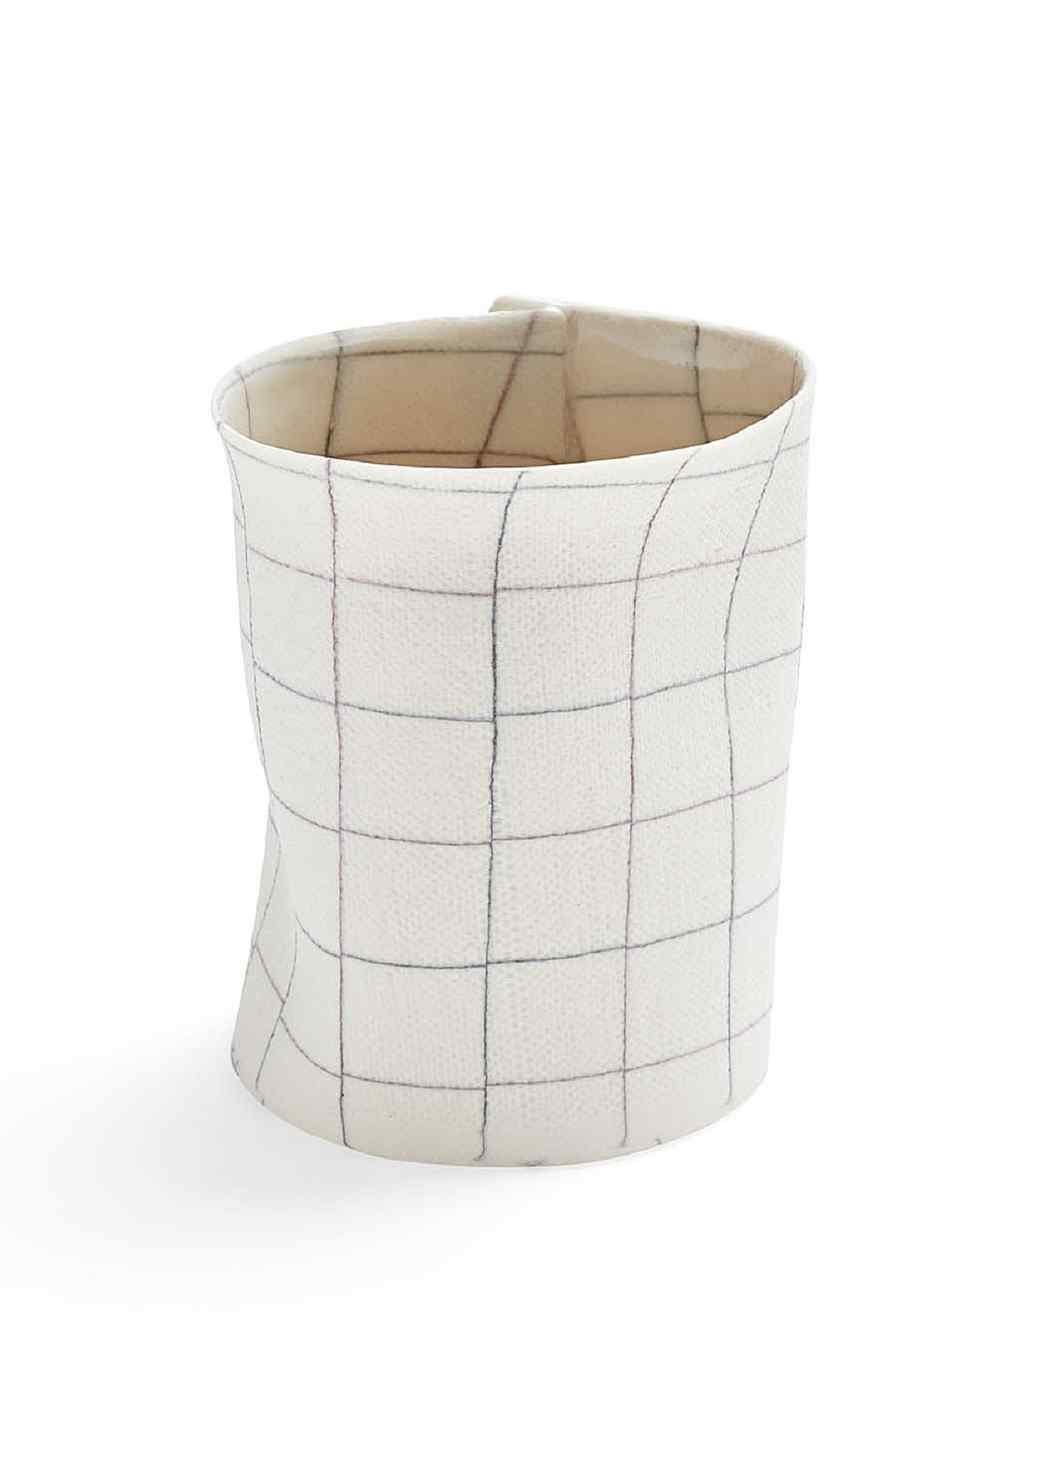 1399056-ovo-cermaics-plaid-porcelain-cup-a-vs2.jpg (skyword:202892)